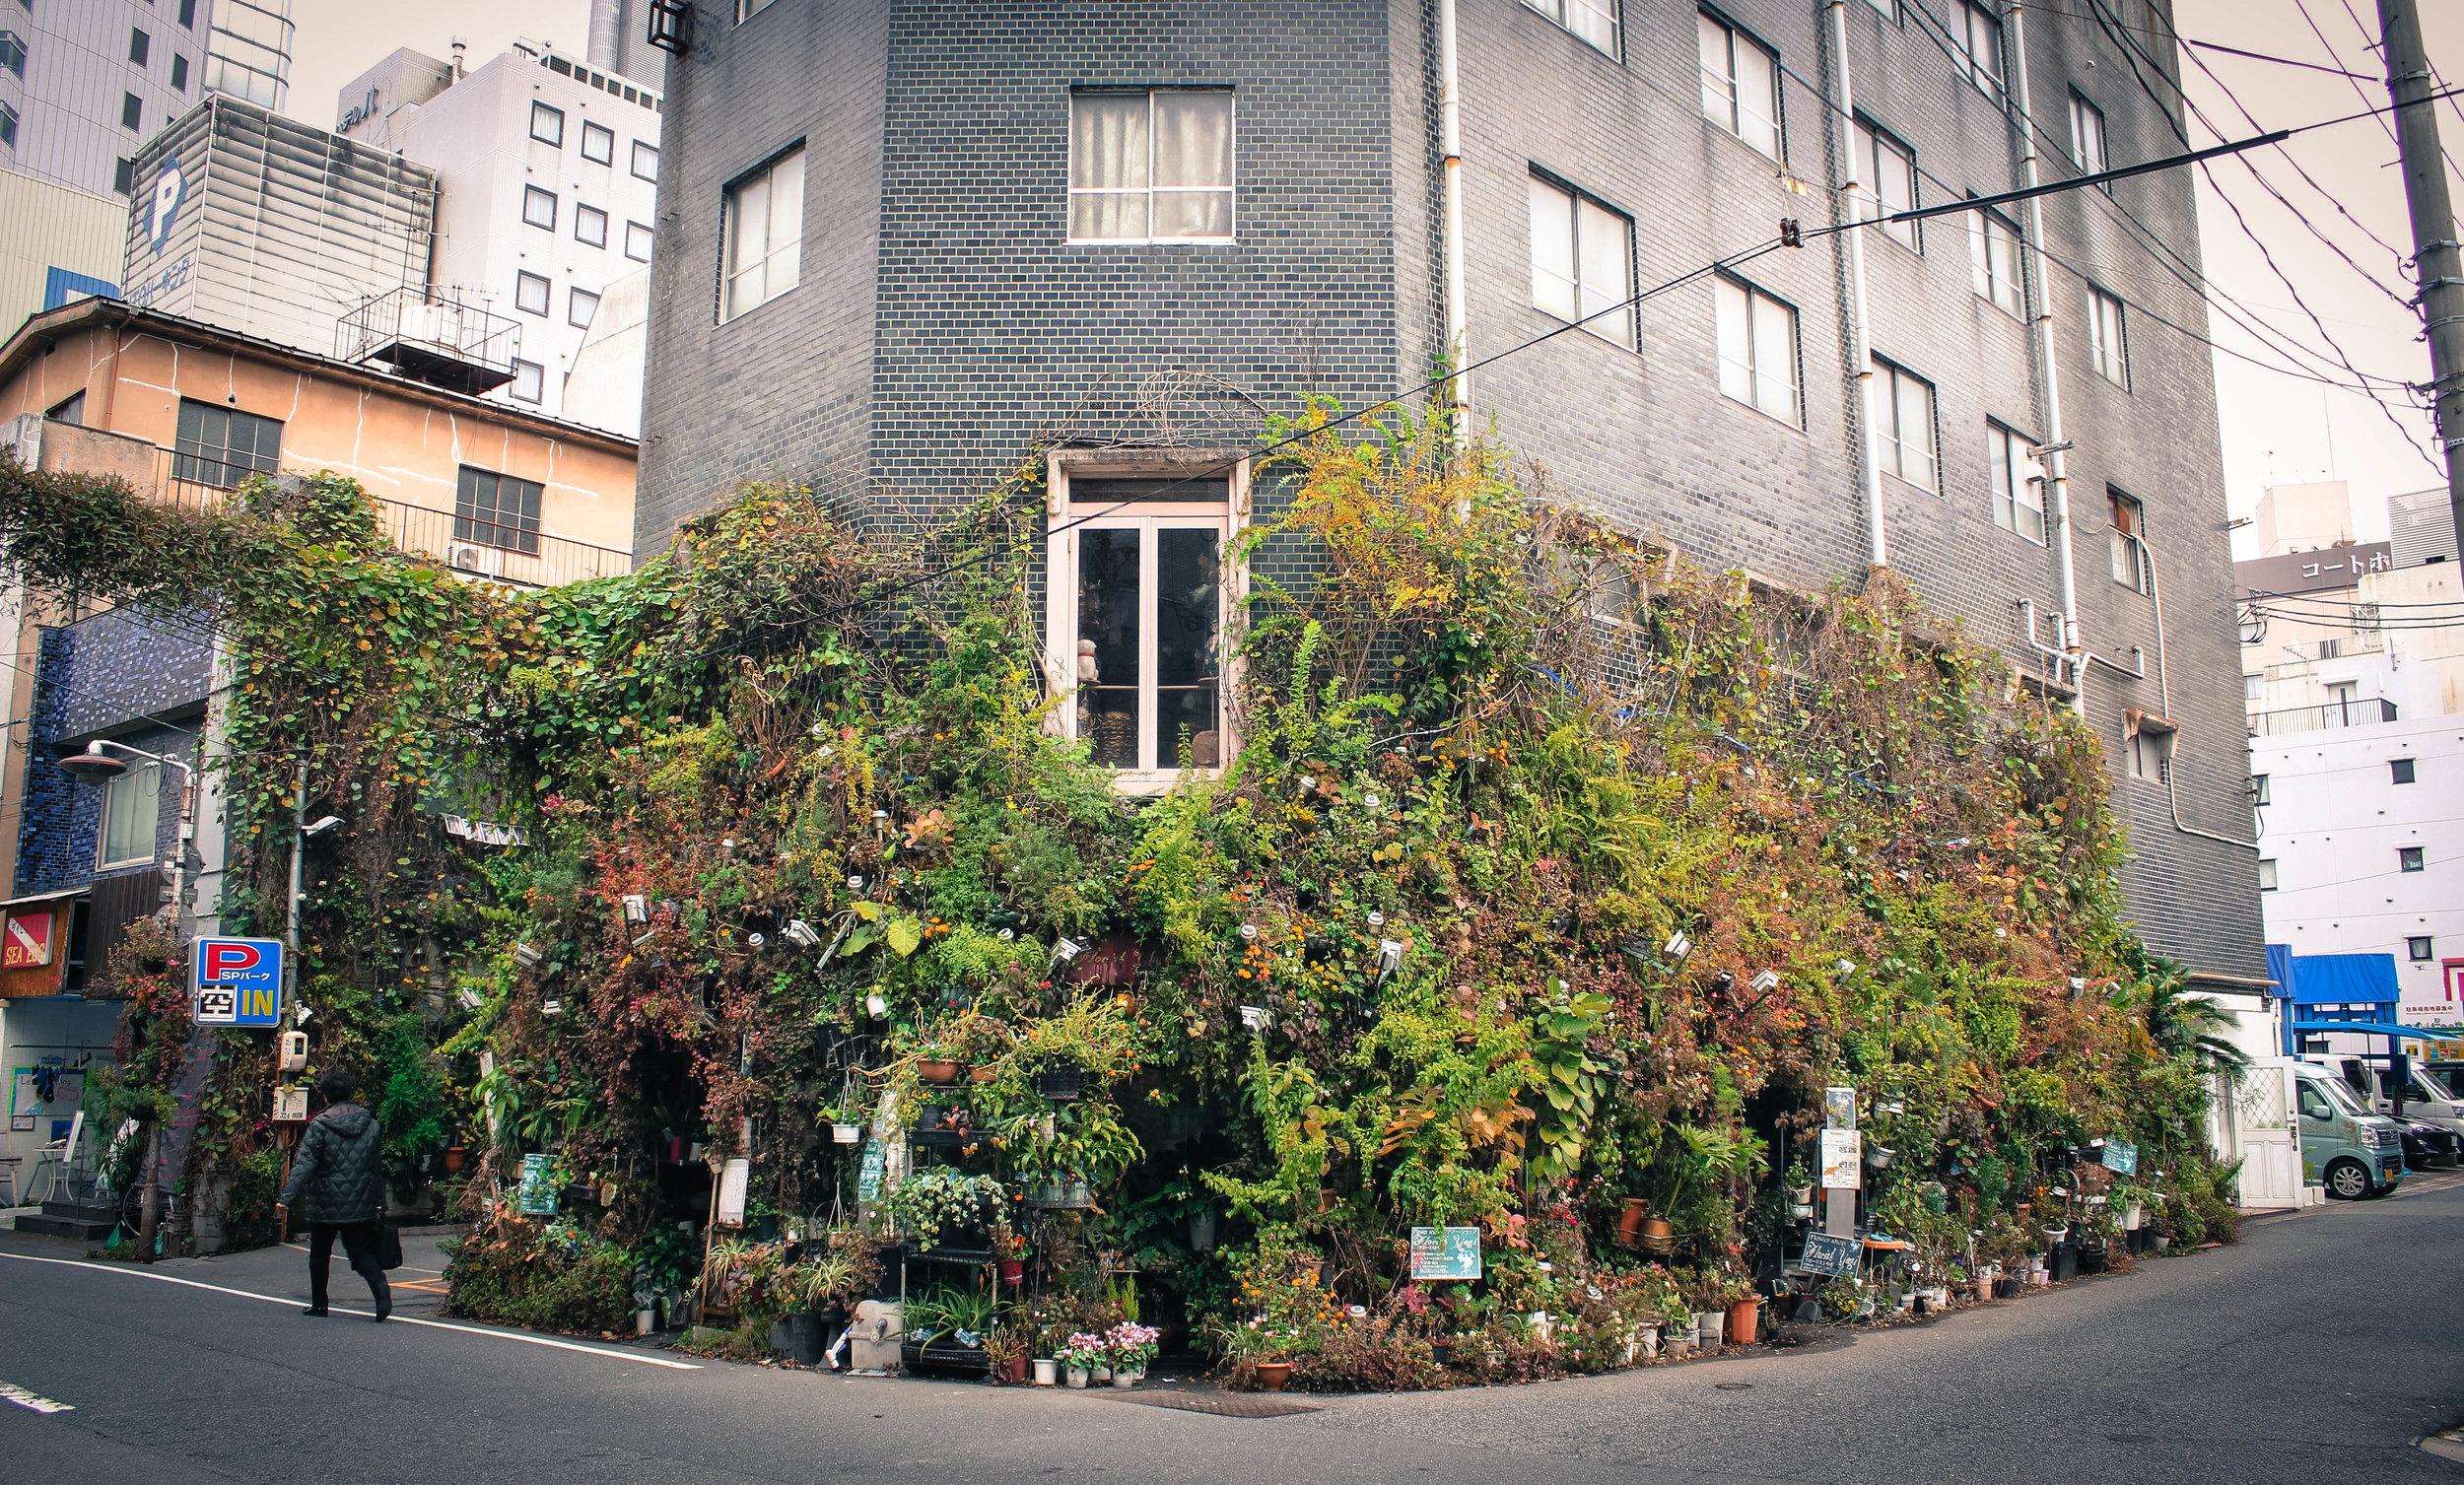 Beautiful house goals.